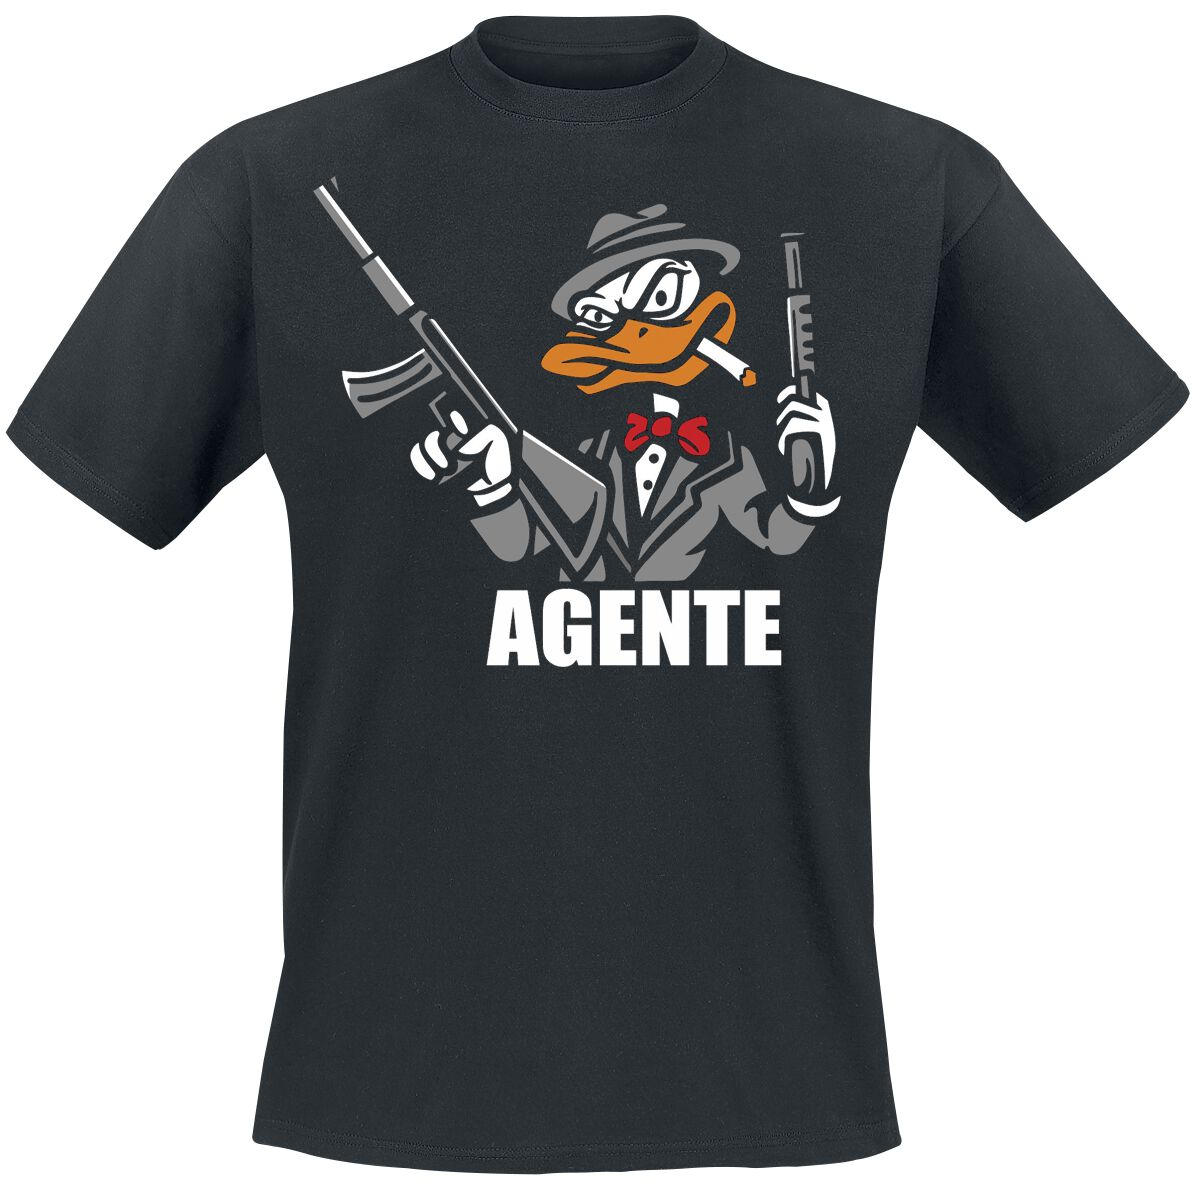 Image of Agente T-Shirt schwarz